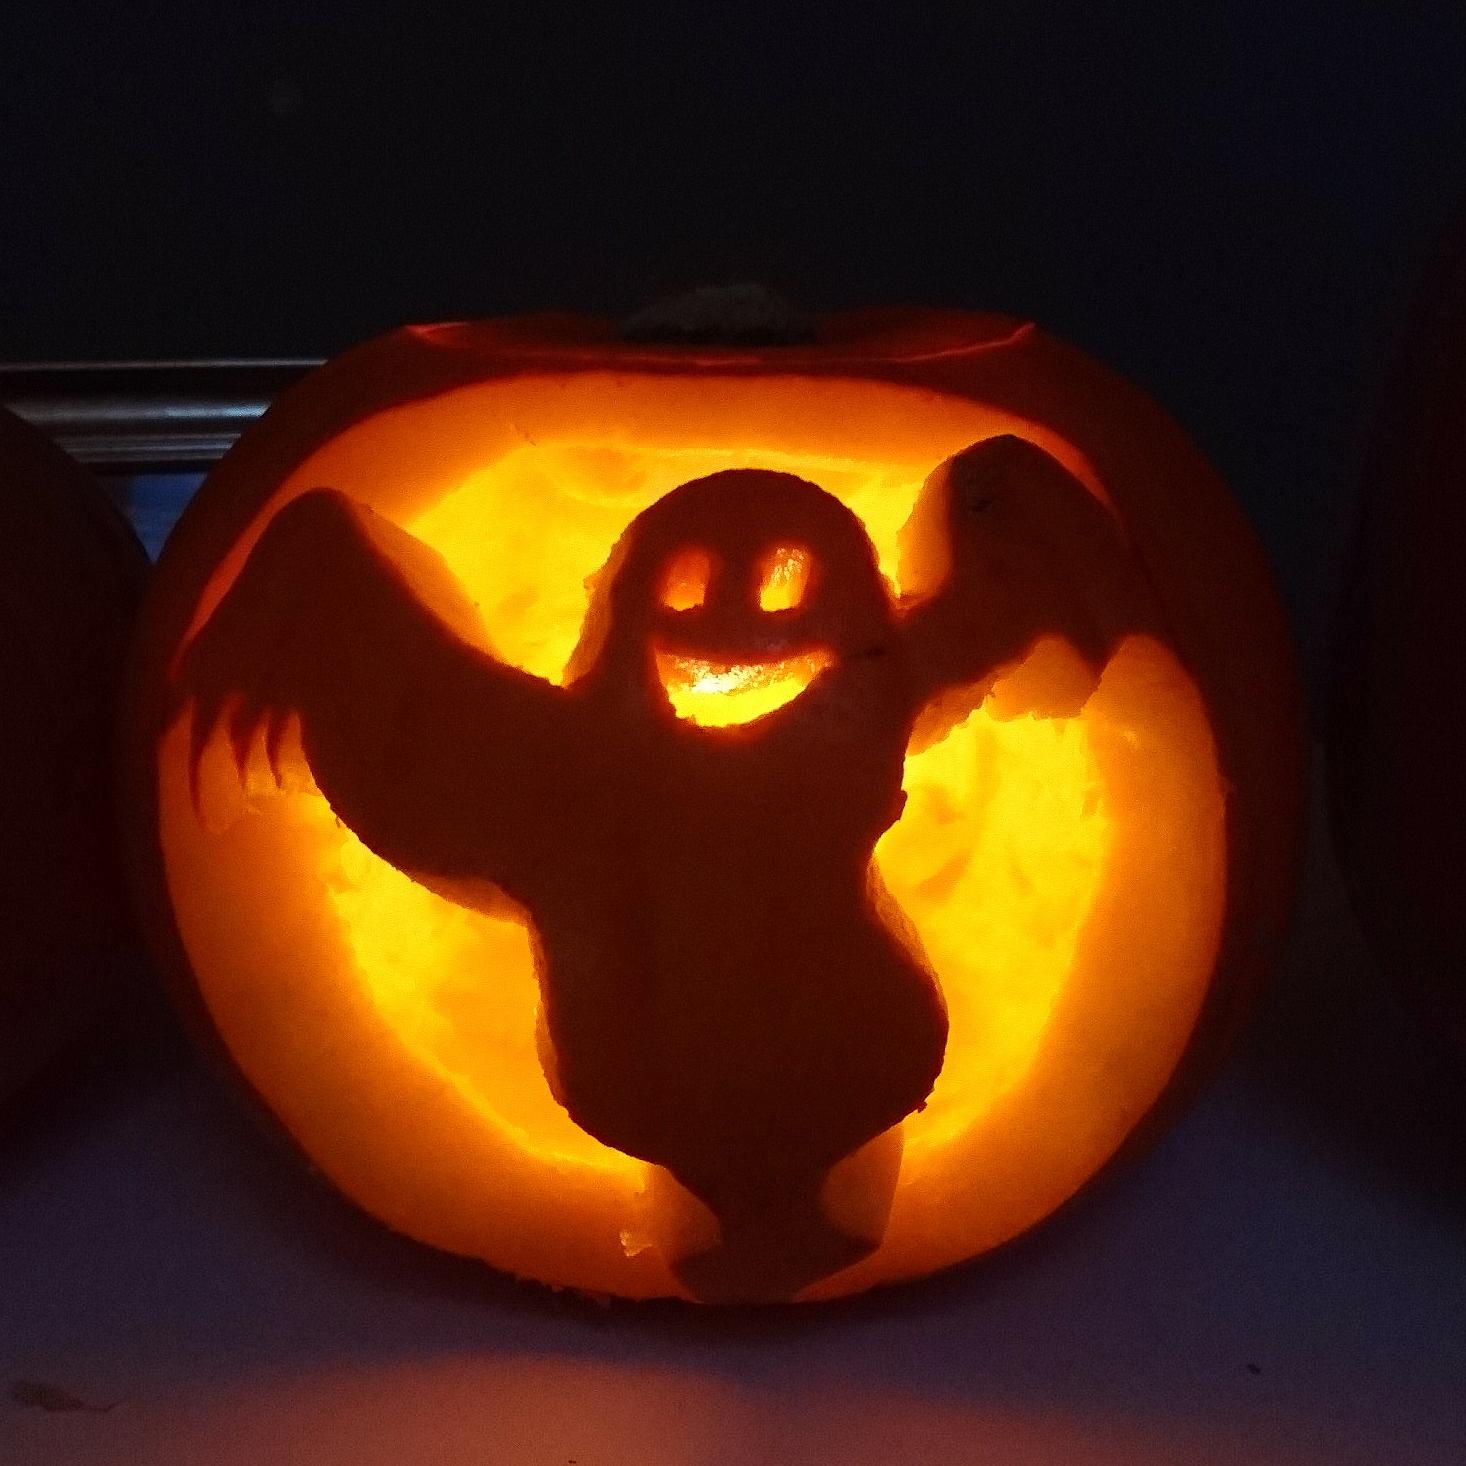 Kürbis schnitzen Vorlage | Halloween Tradition | Herbst Deko Ideen | judetta.de